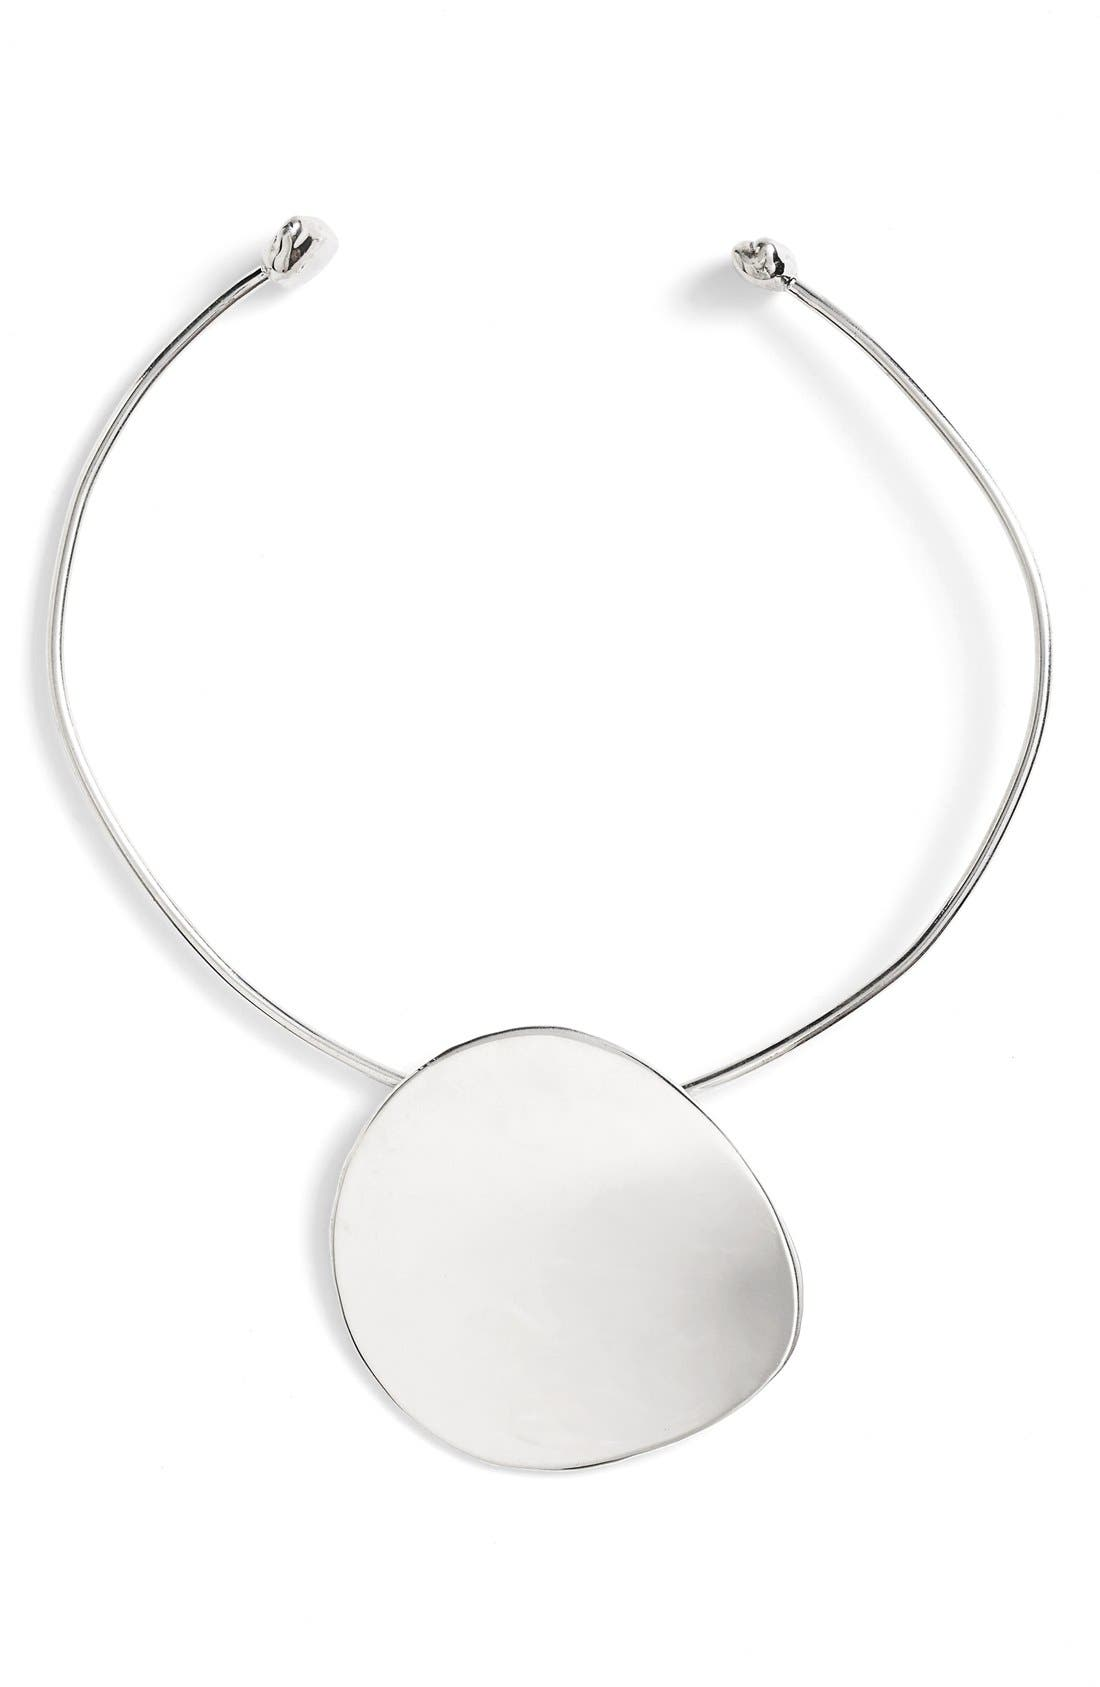 Pendo Collar Necklace,                         Main,                         color, Silver